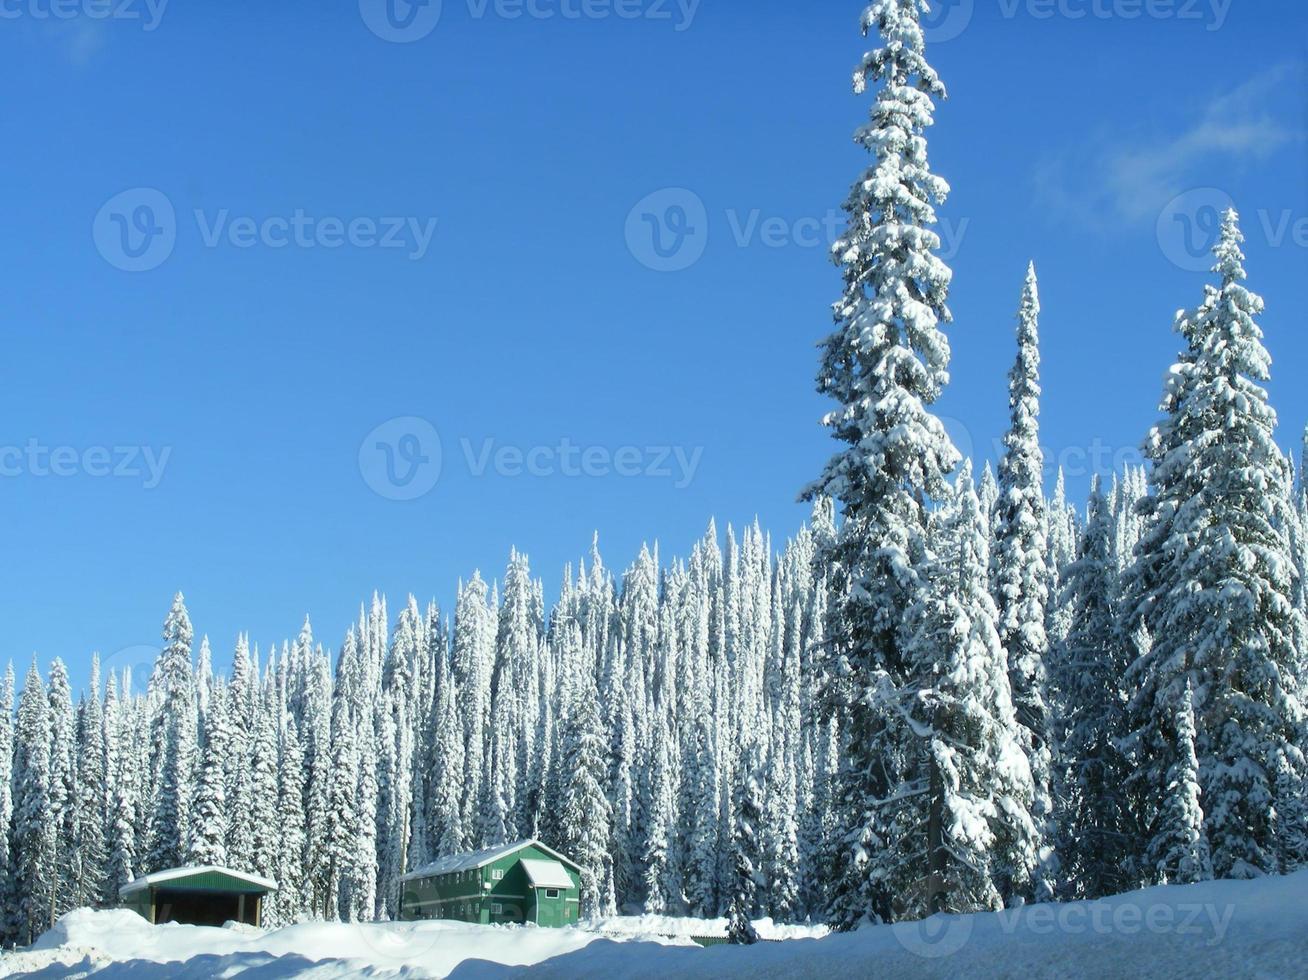 vintern i bergen foto